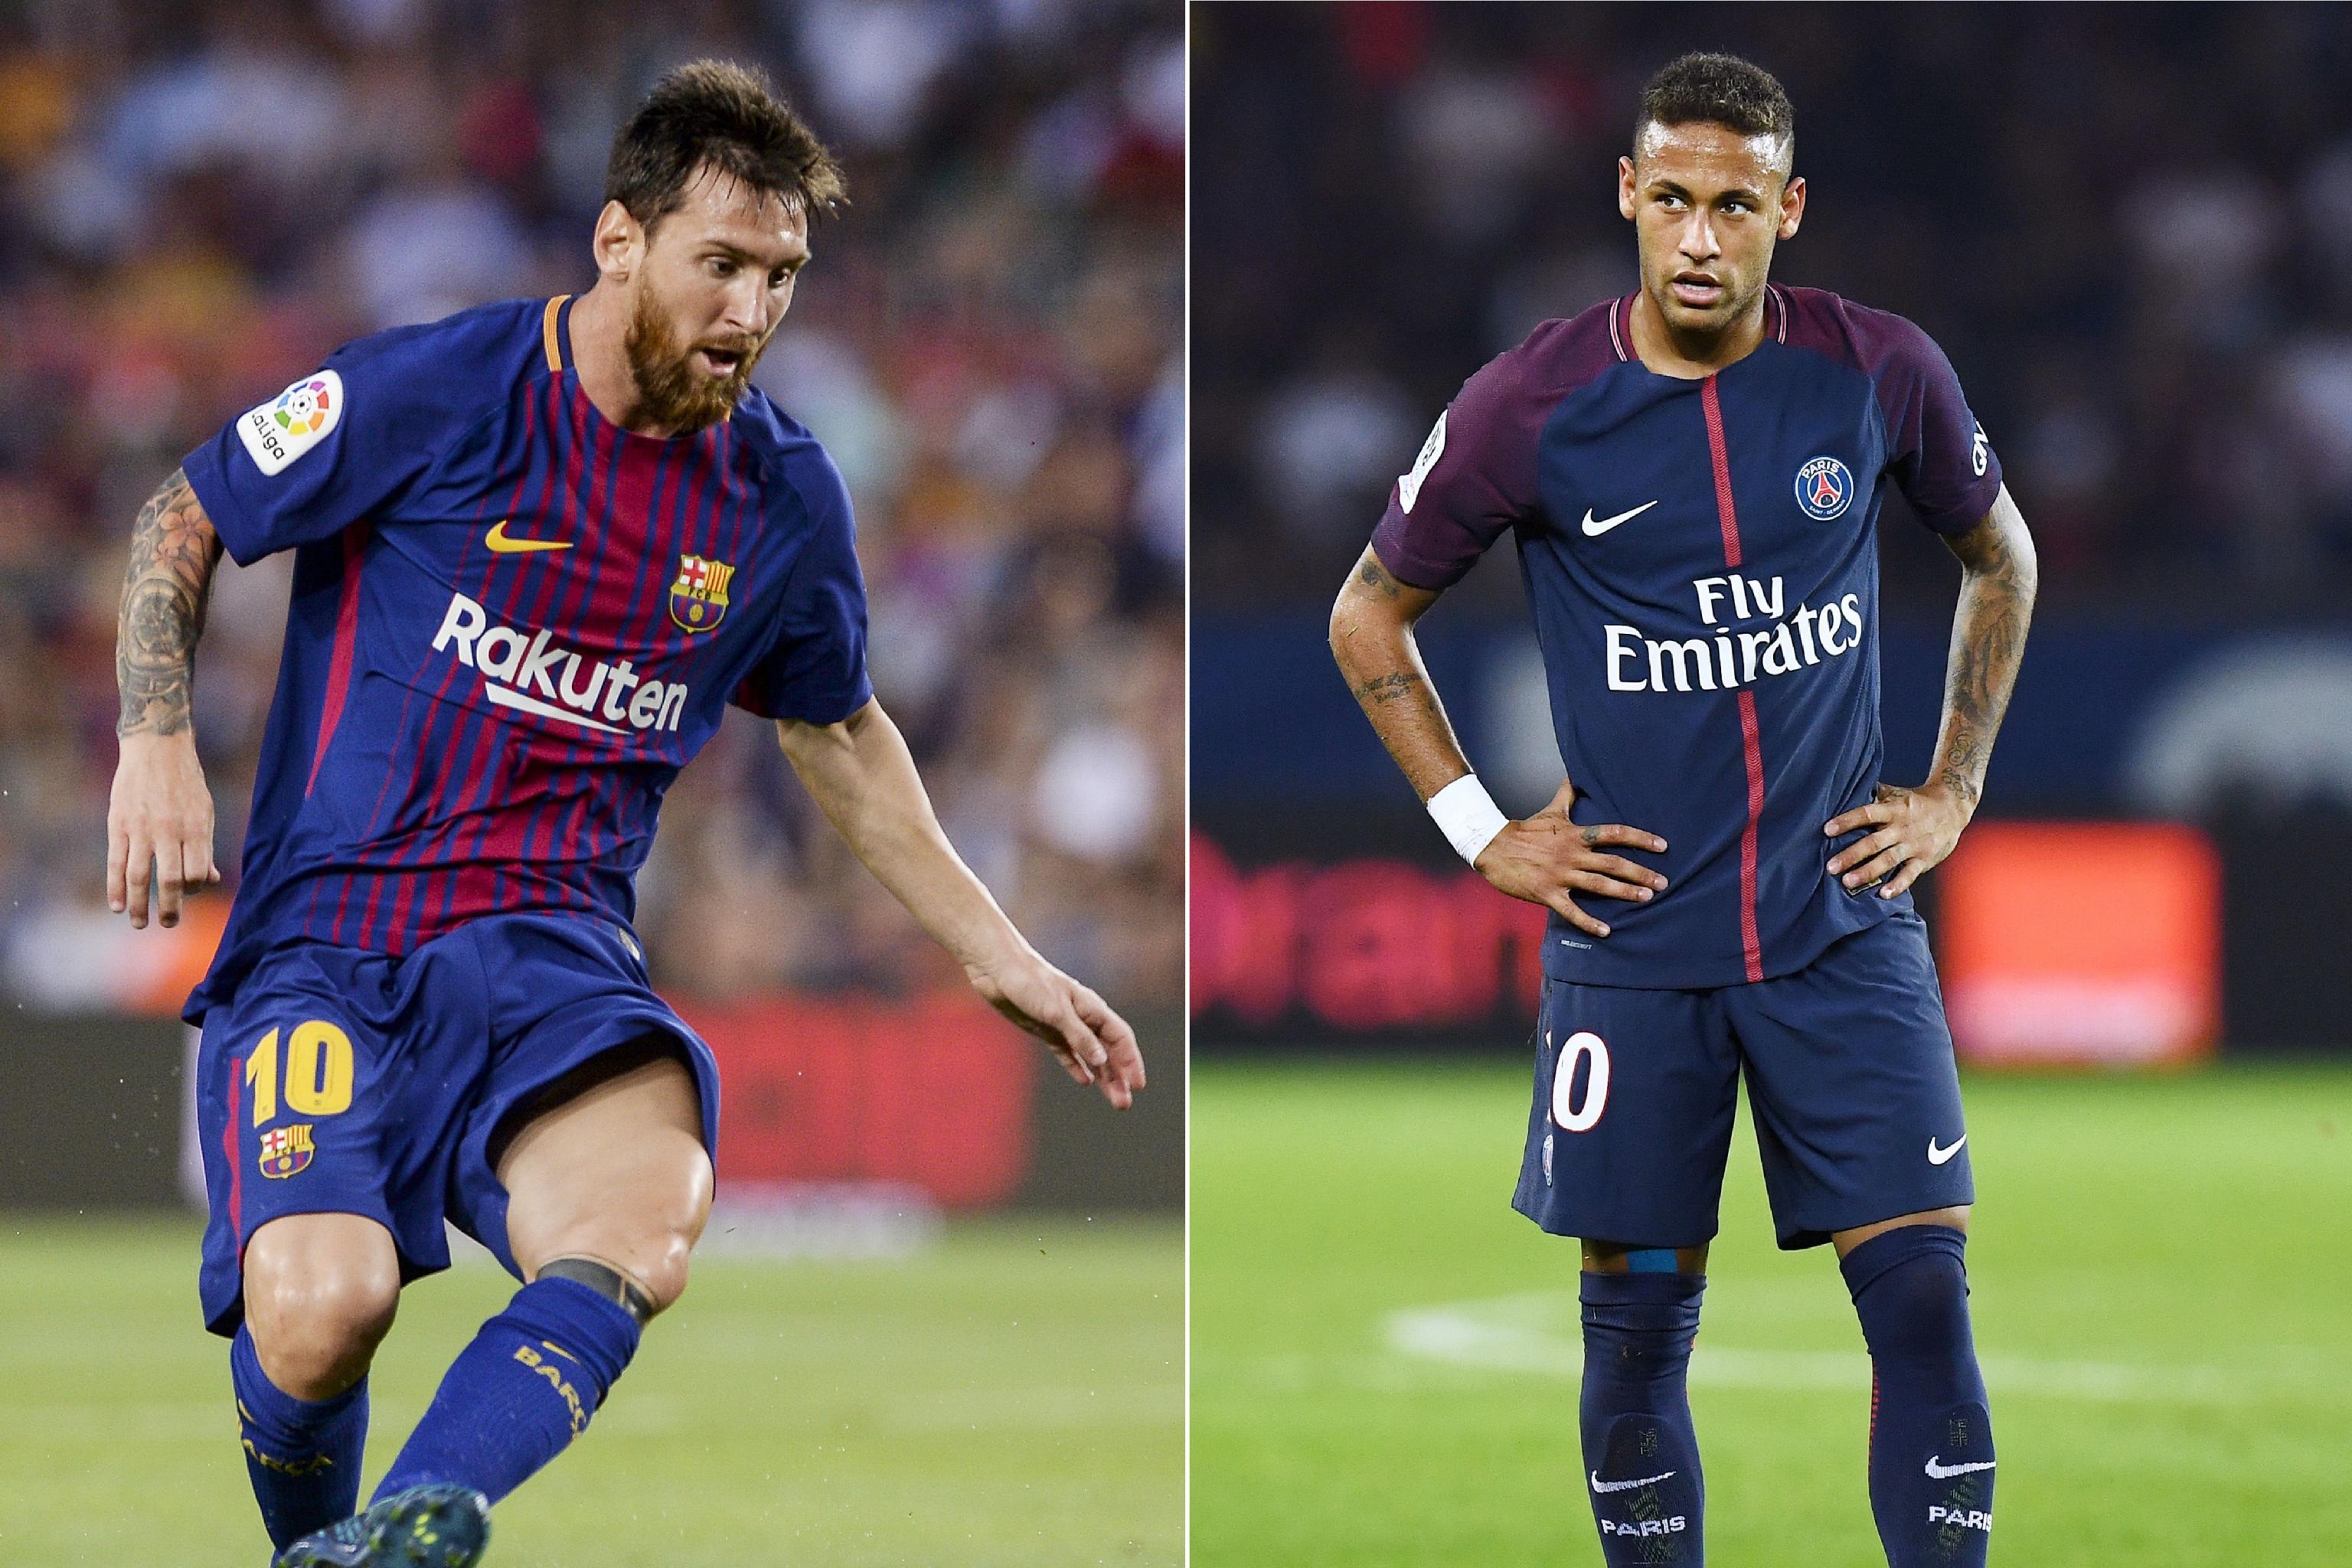 Paris Saint Germain in top for the hunt of Lionel Messi